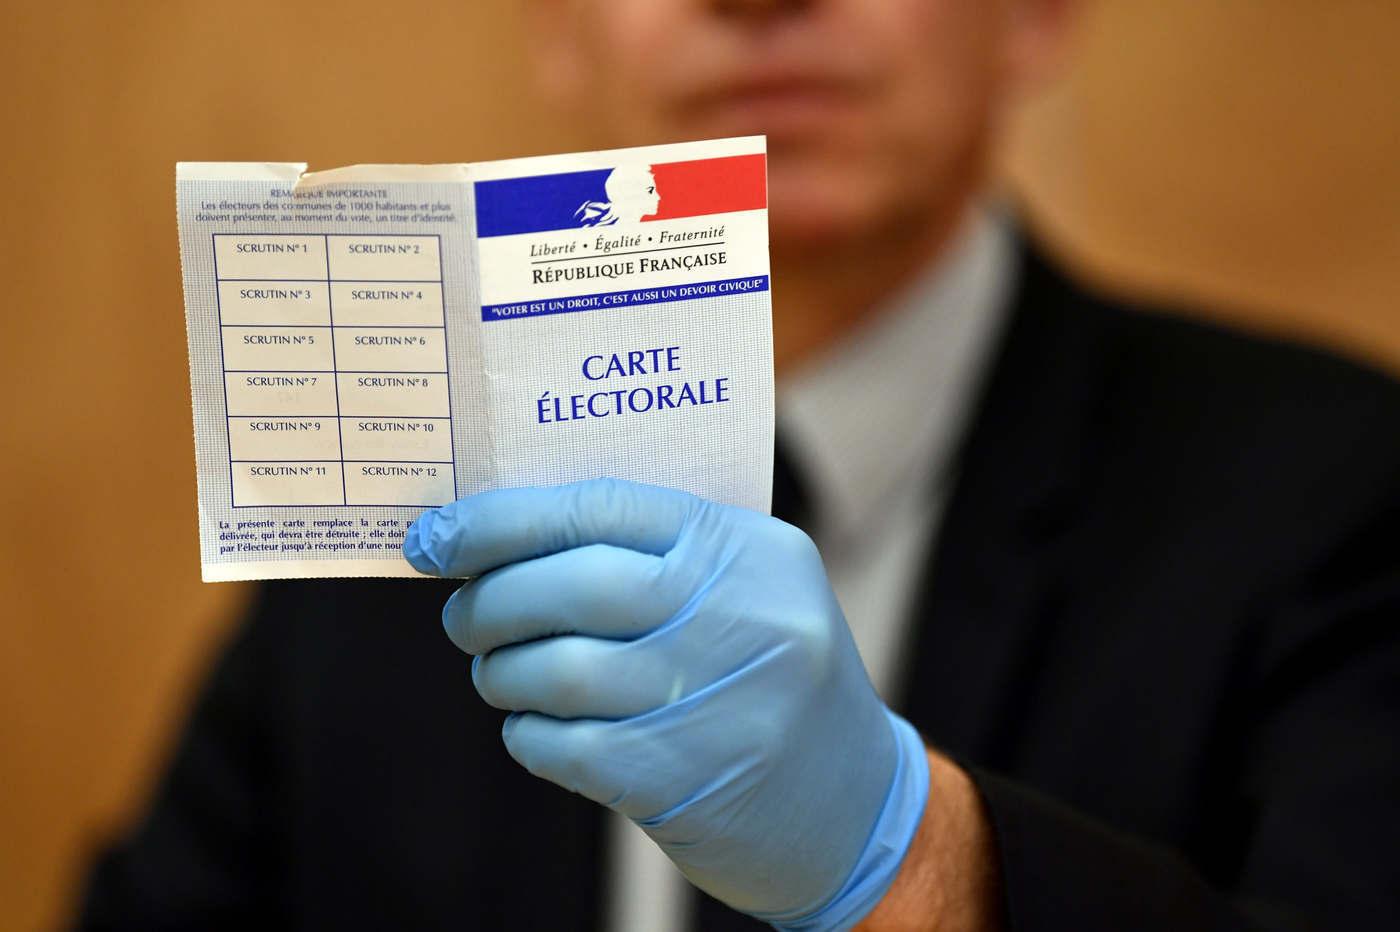 Election of June 20 and 27, 2021 Election of June 20 and 27, 2021 respecting the barrier gestures (DR)